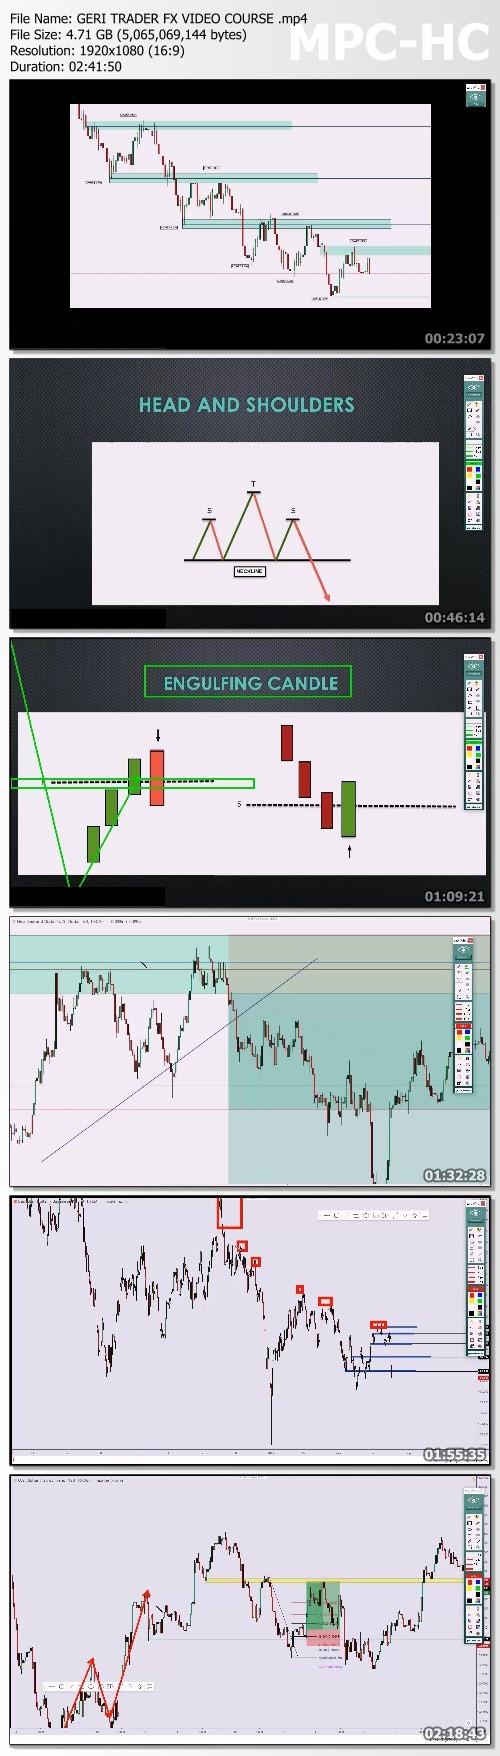 Geri Trader FX Video Course 1